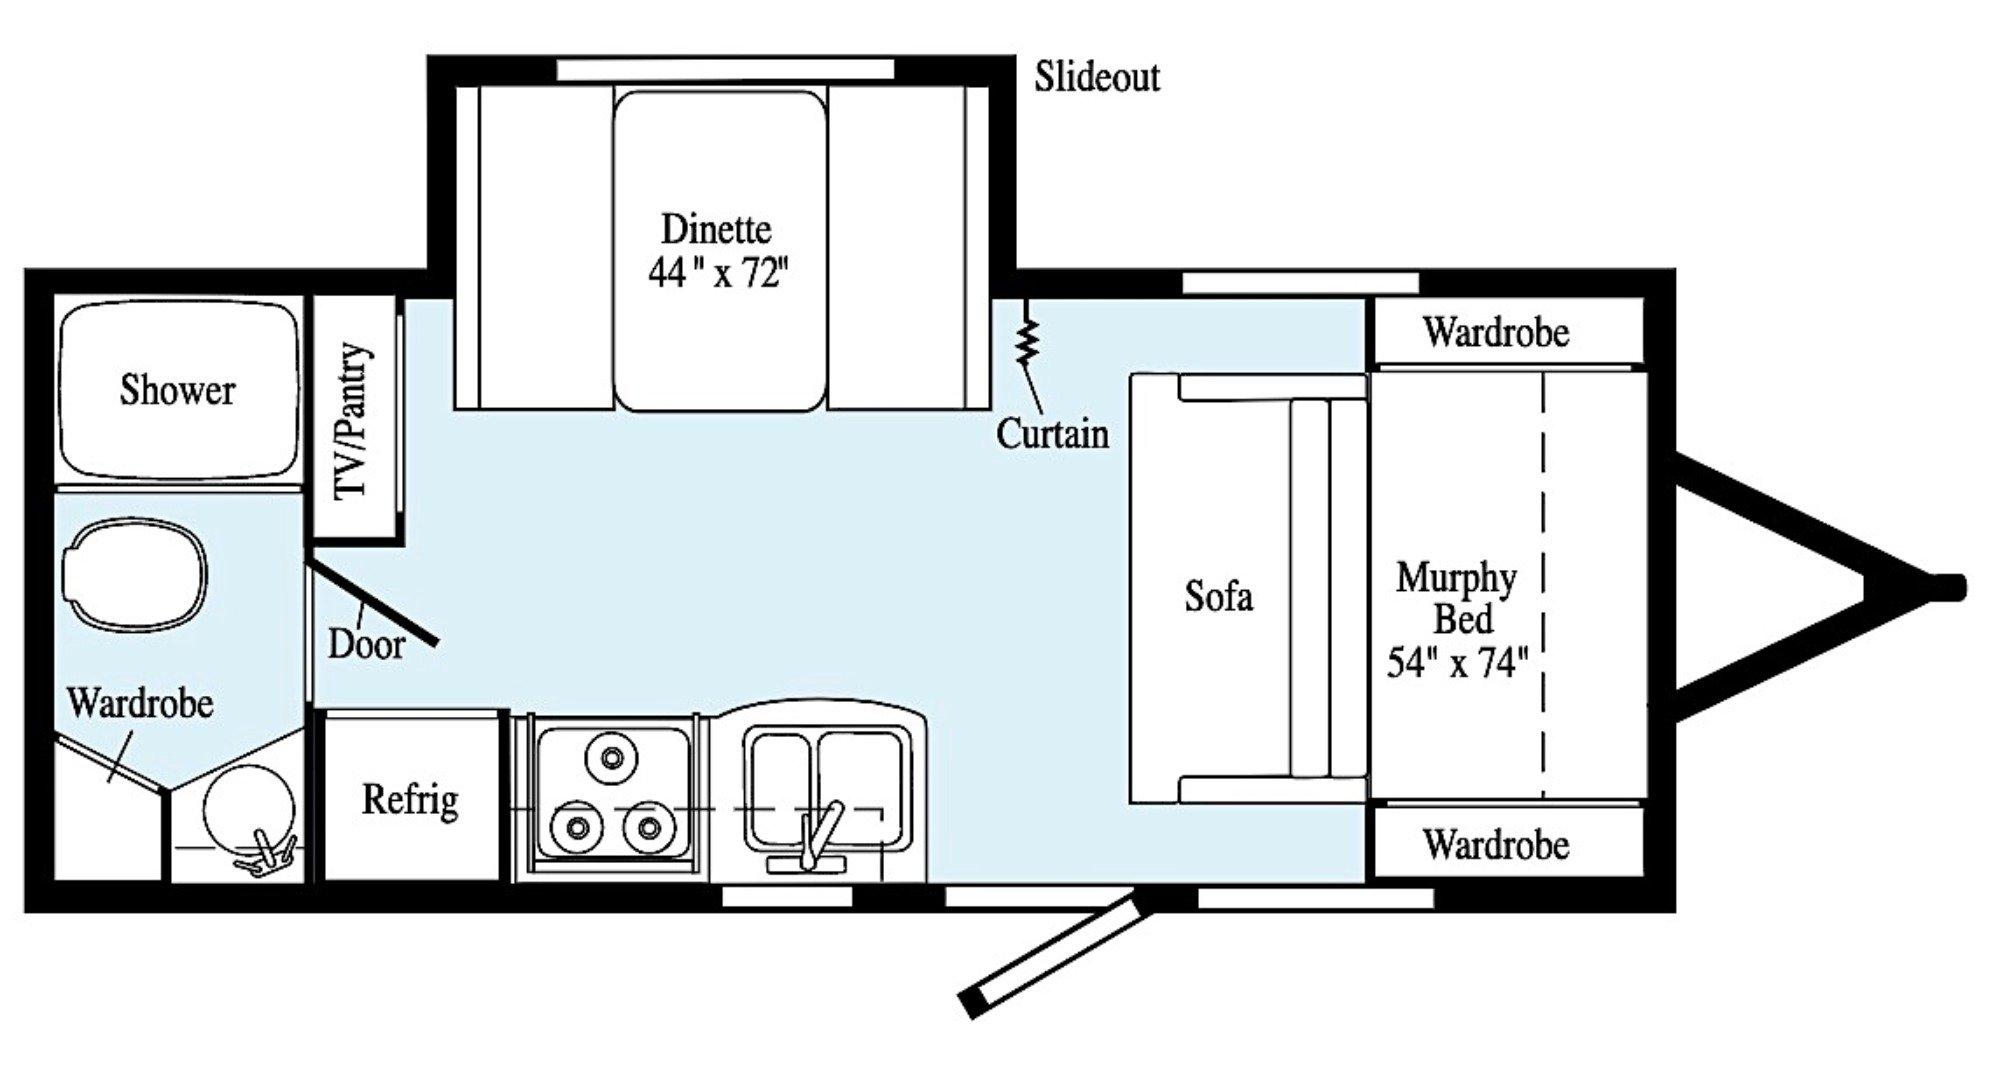 View Floor Plan for 2021 WINNEBAGO MICRO MINNIE 2108DS